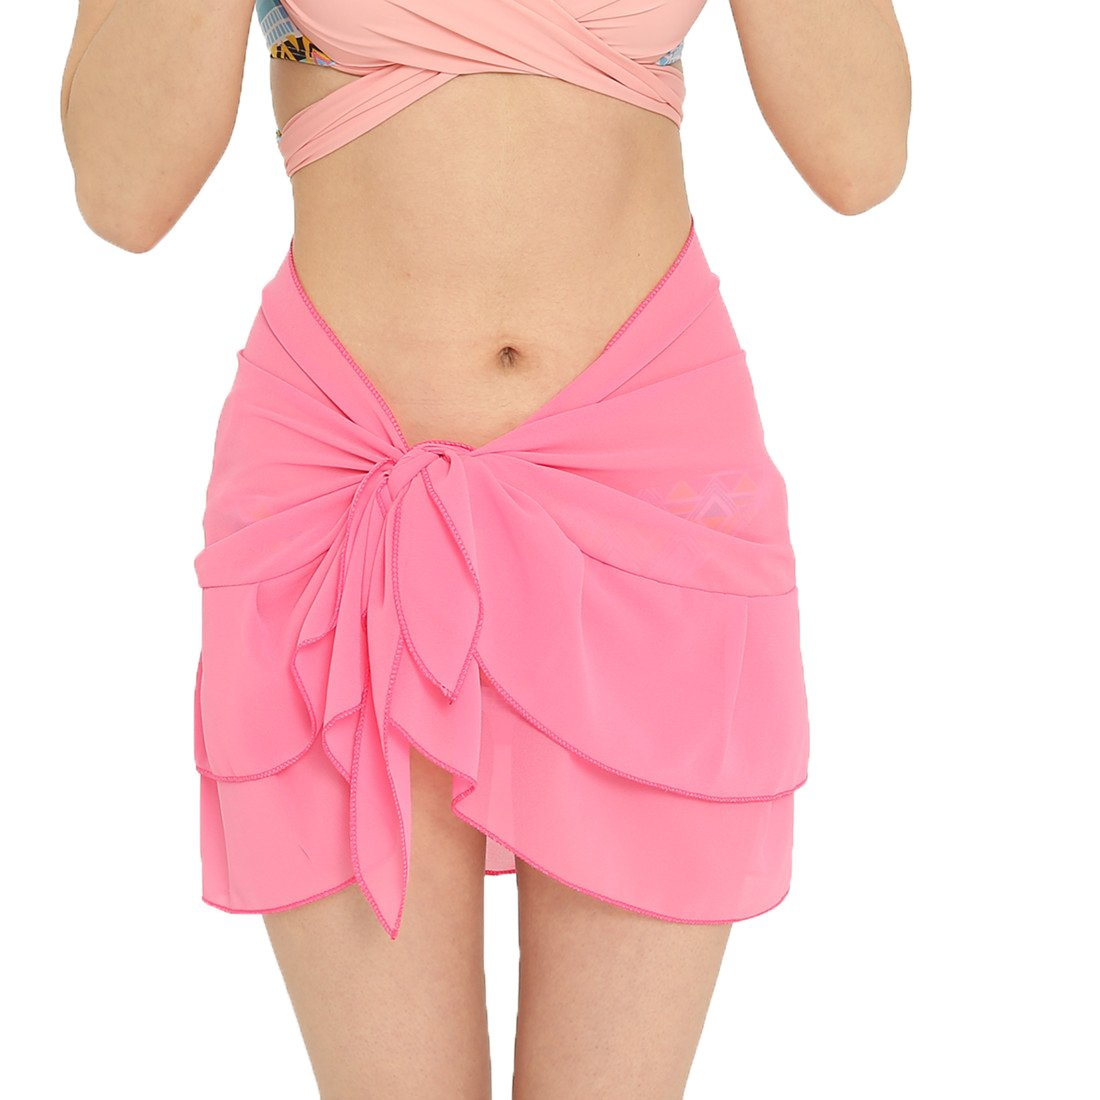 11043ec52f94b Online Cheap wholesale Leeaw Womens Chiffon Beach Cover Up Sarong Multi  Swimwear Ruffle Skirt Swimsuit Wrap Cover-Ups Suppliers